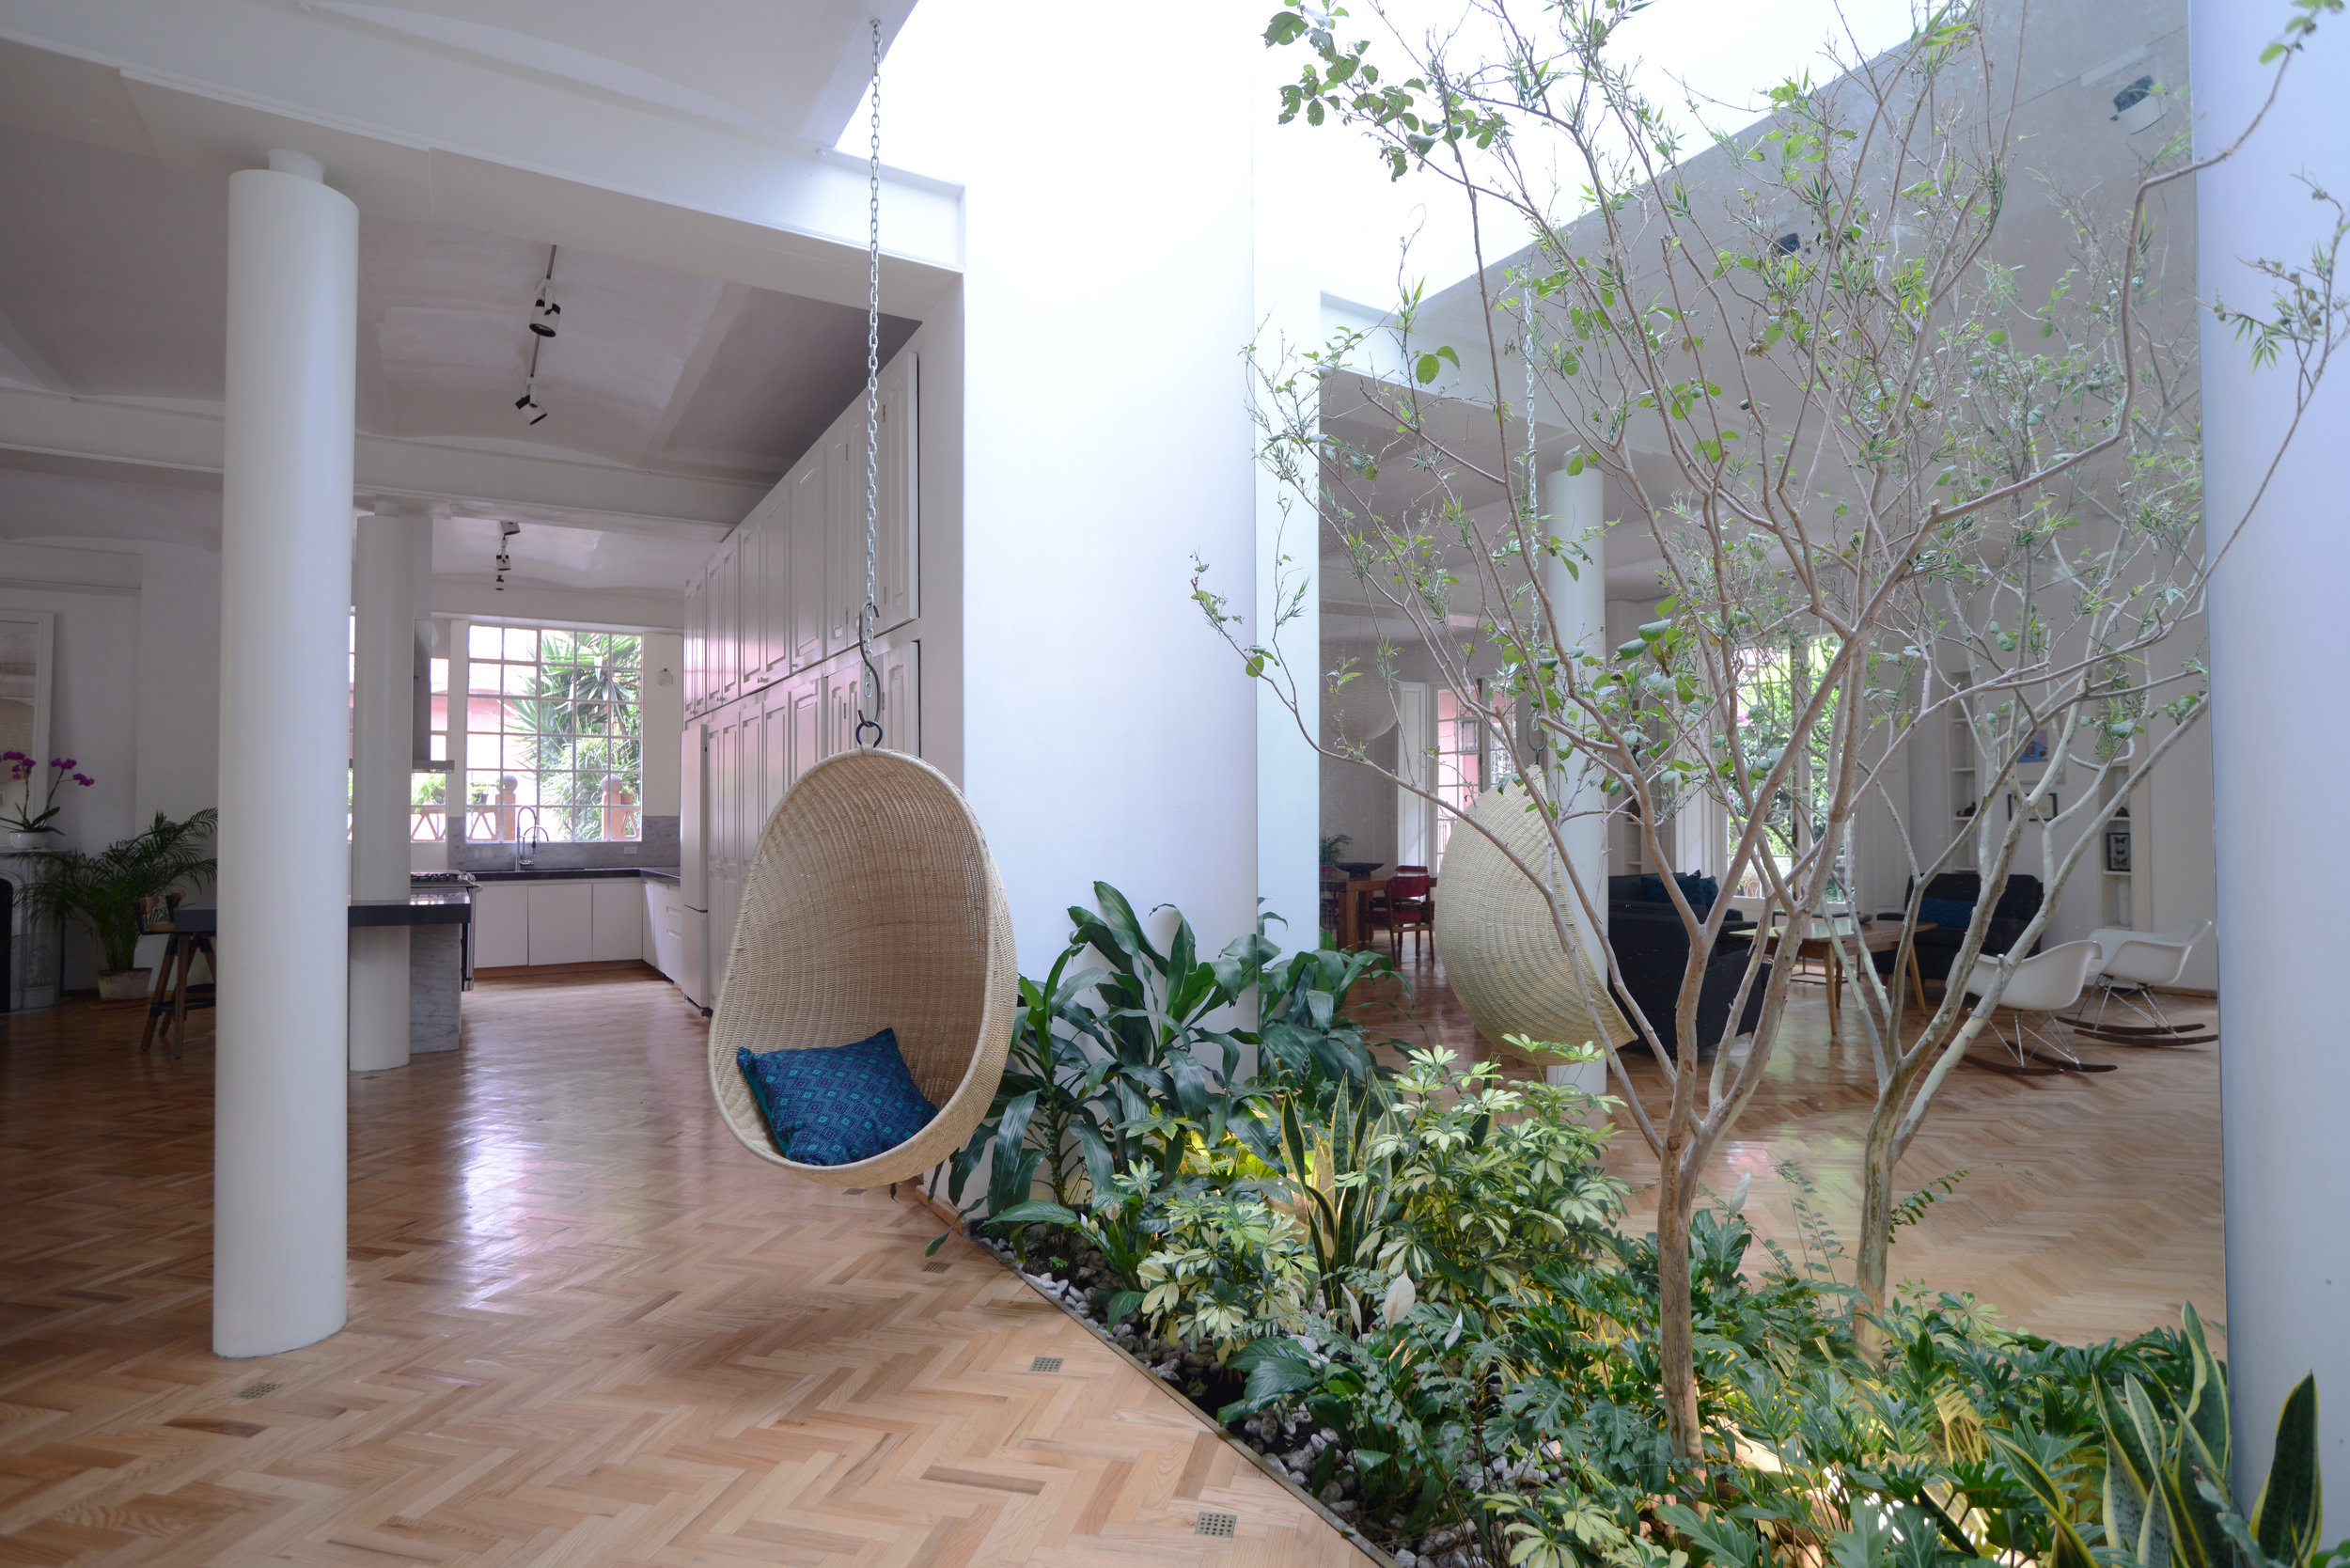 Casa Vieyra_3_BBL ARQUITECTOS.jpg